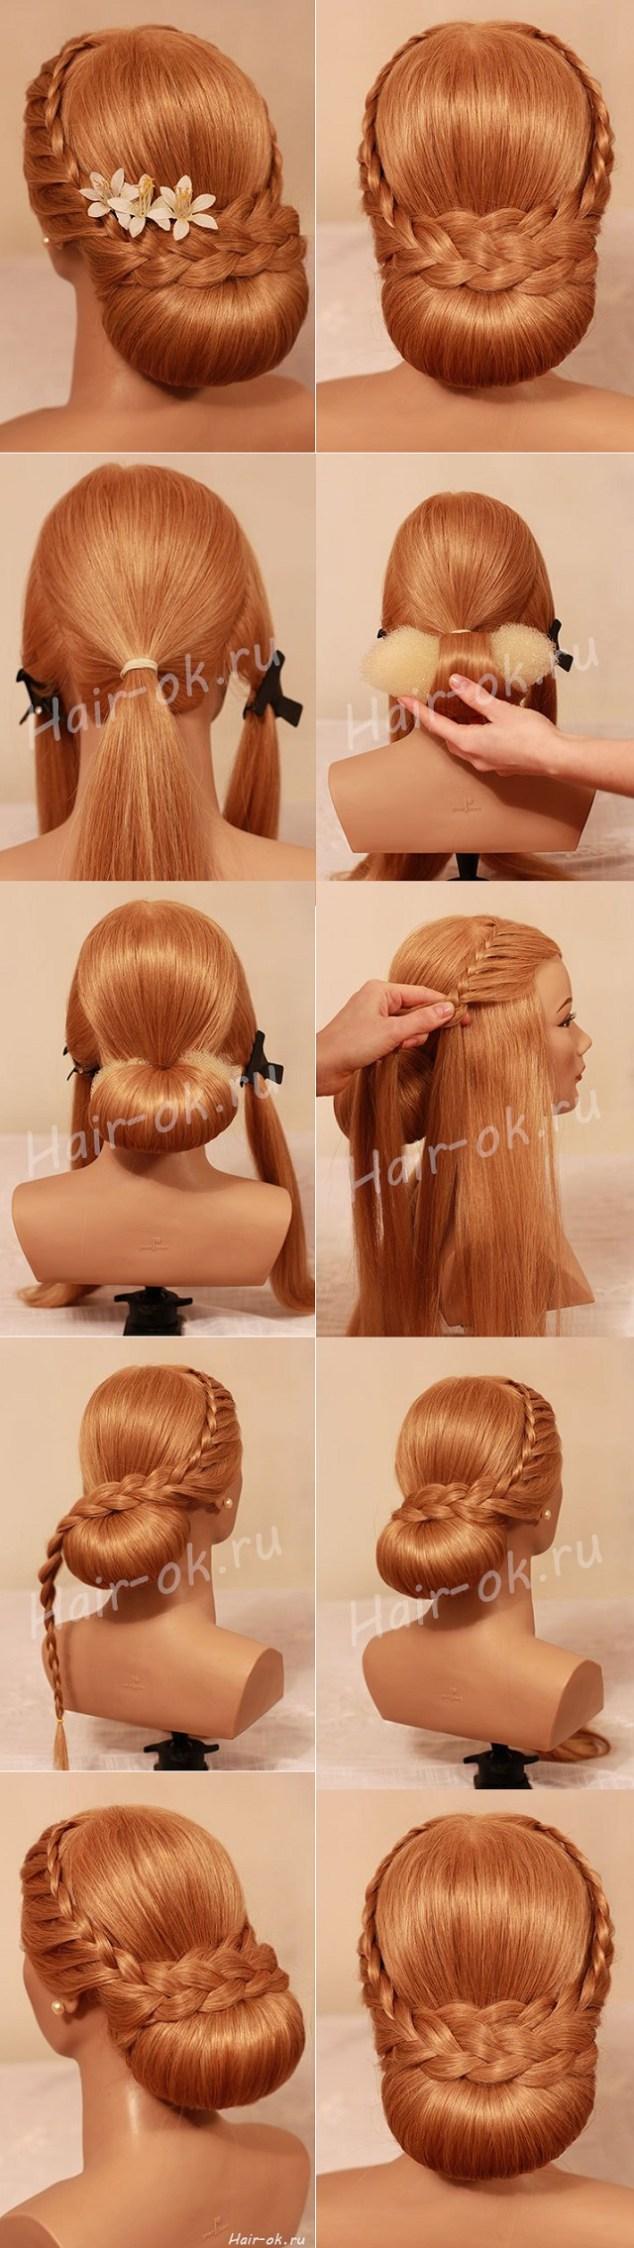 Diy beautiful evening hairstyle ヘアアレンジ pinterest evening